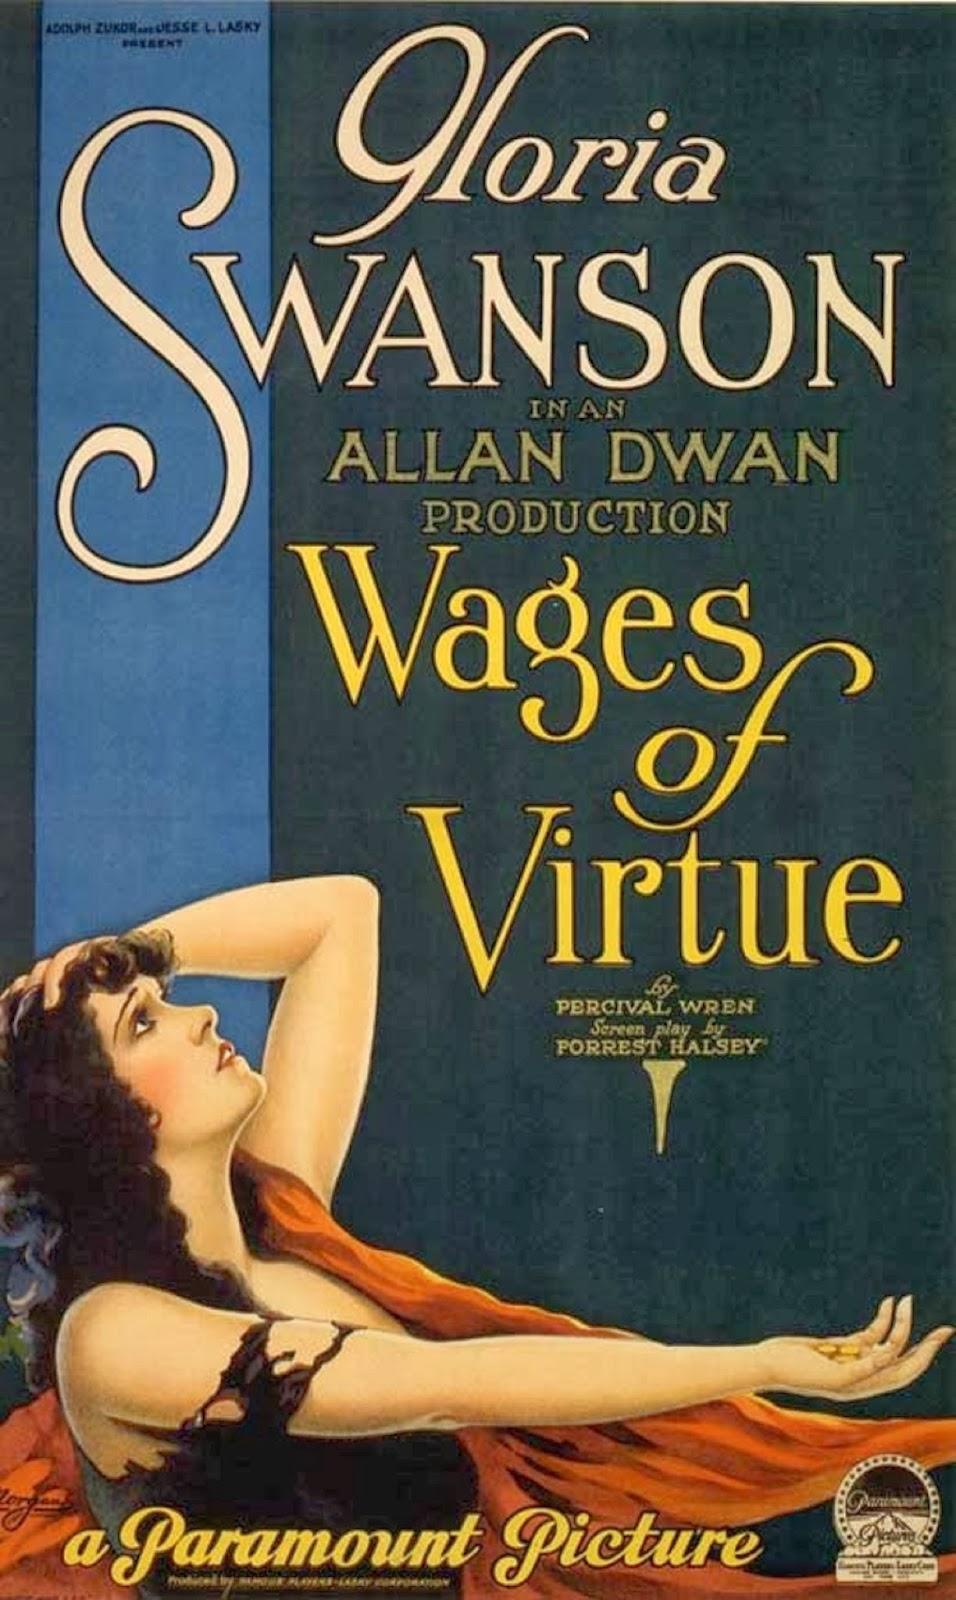 Gloria Swanson movie posters, 1920s | Matthew's Island of ...